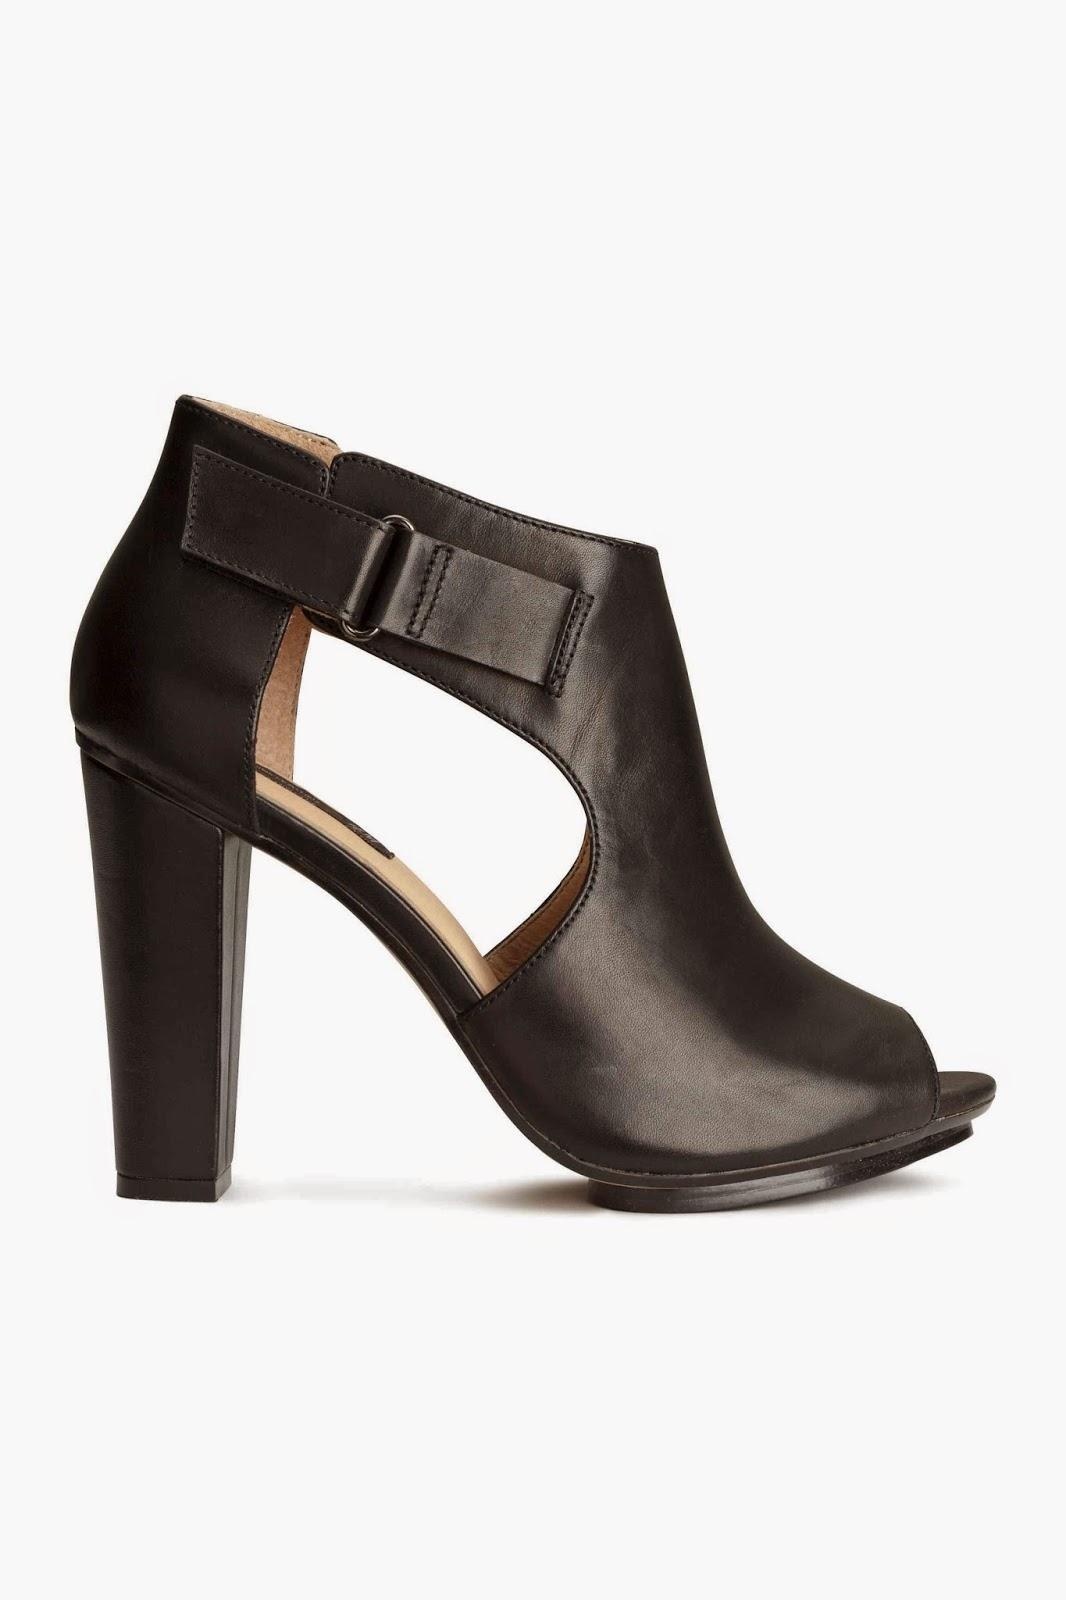 Sandalias piel H&M. Sandalias piel Zara. Botines H&M verano 2015. Zapatos Zara 2015